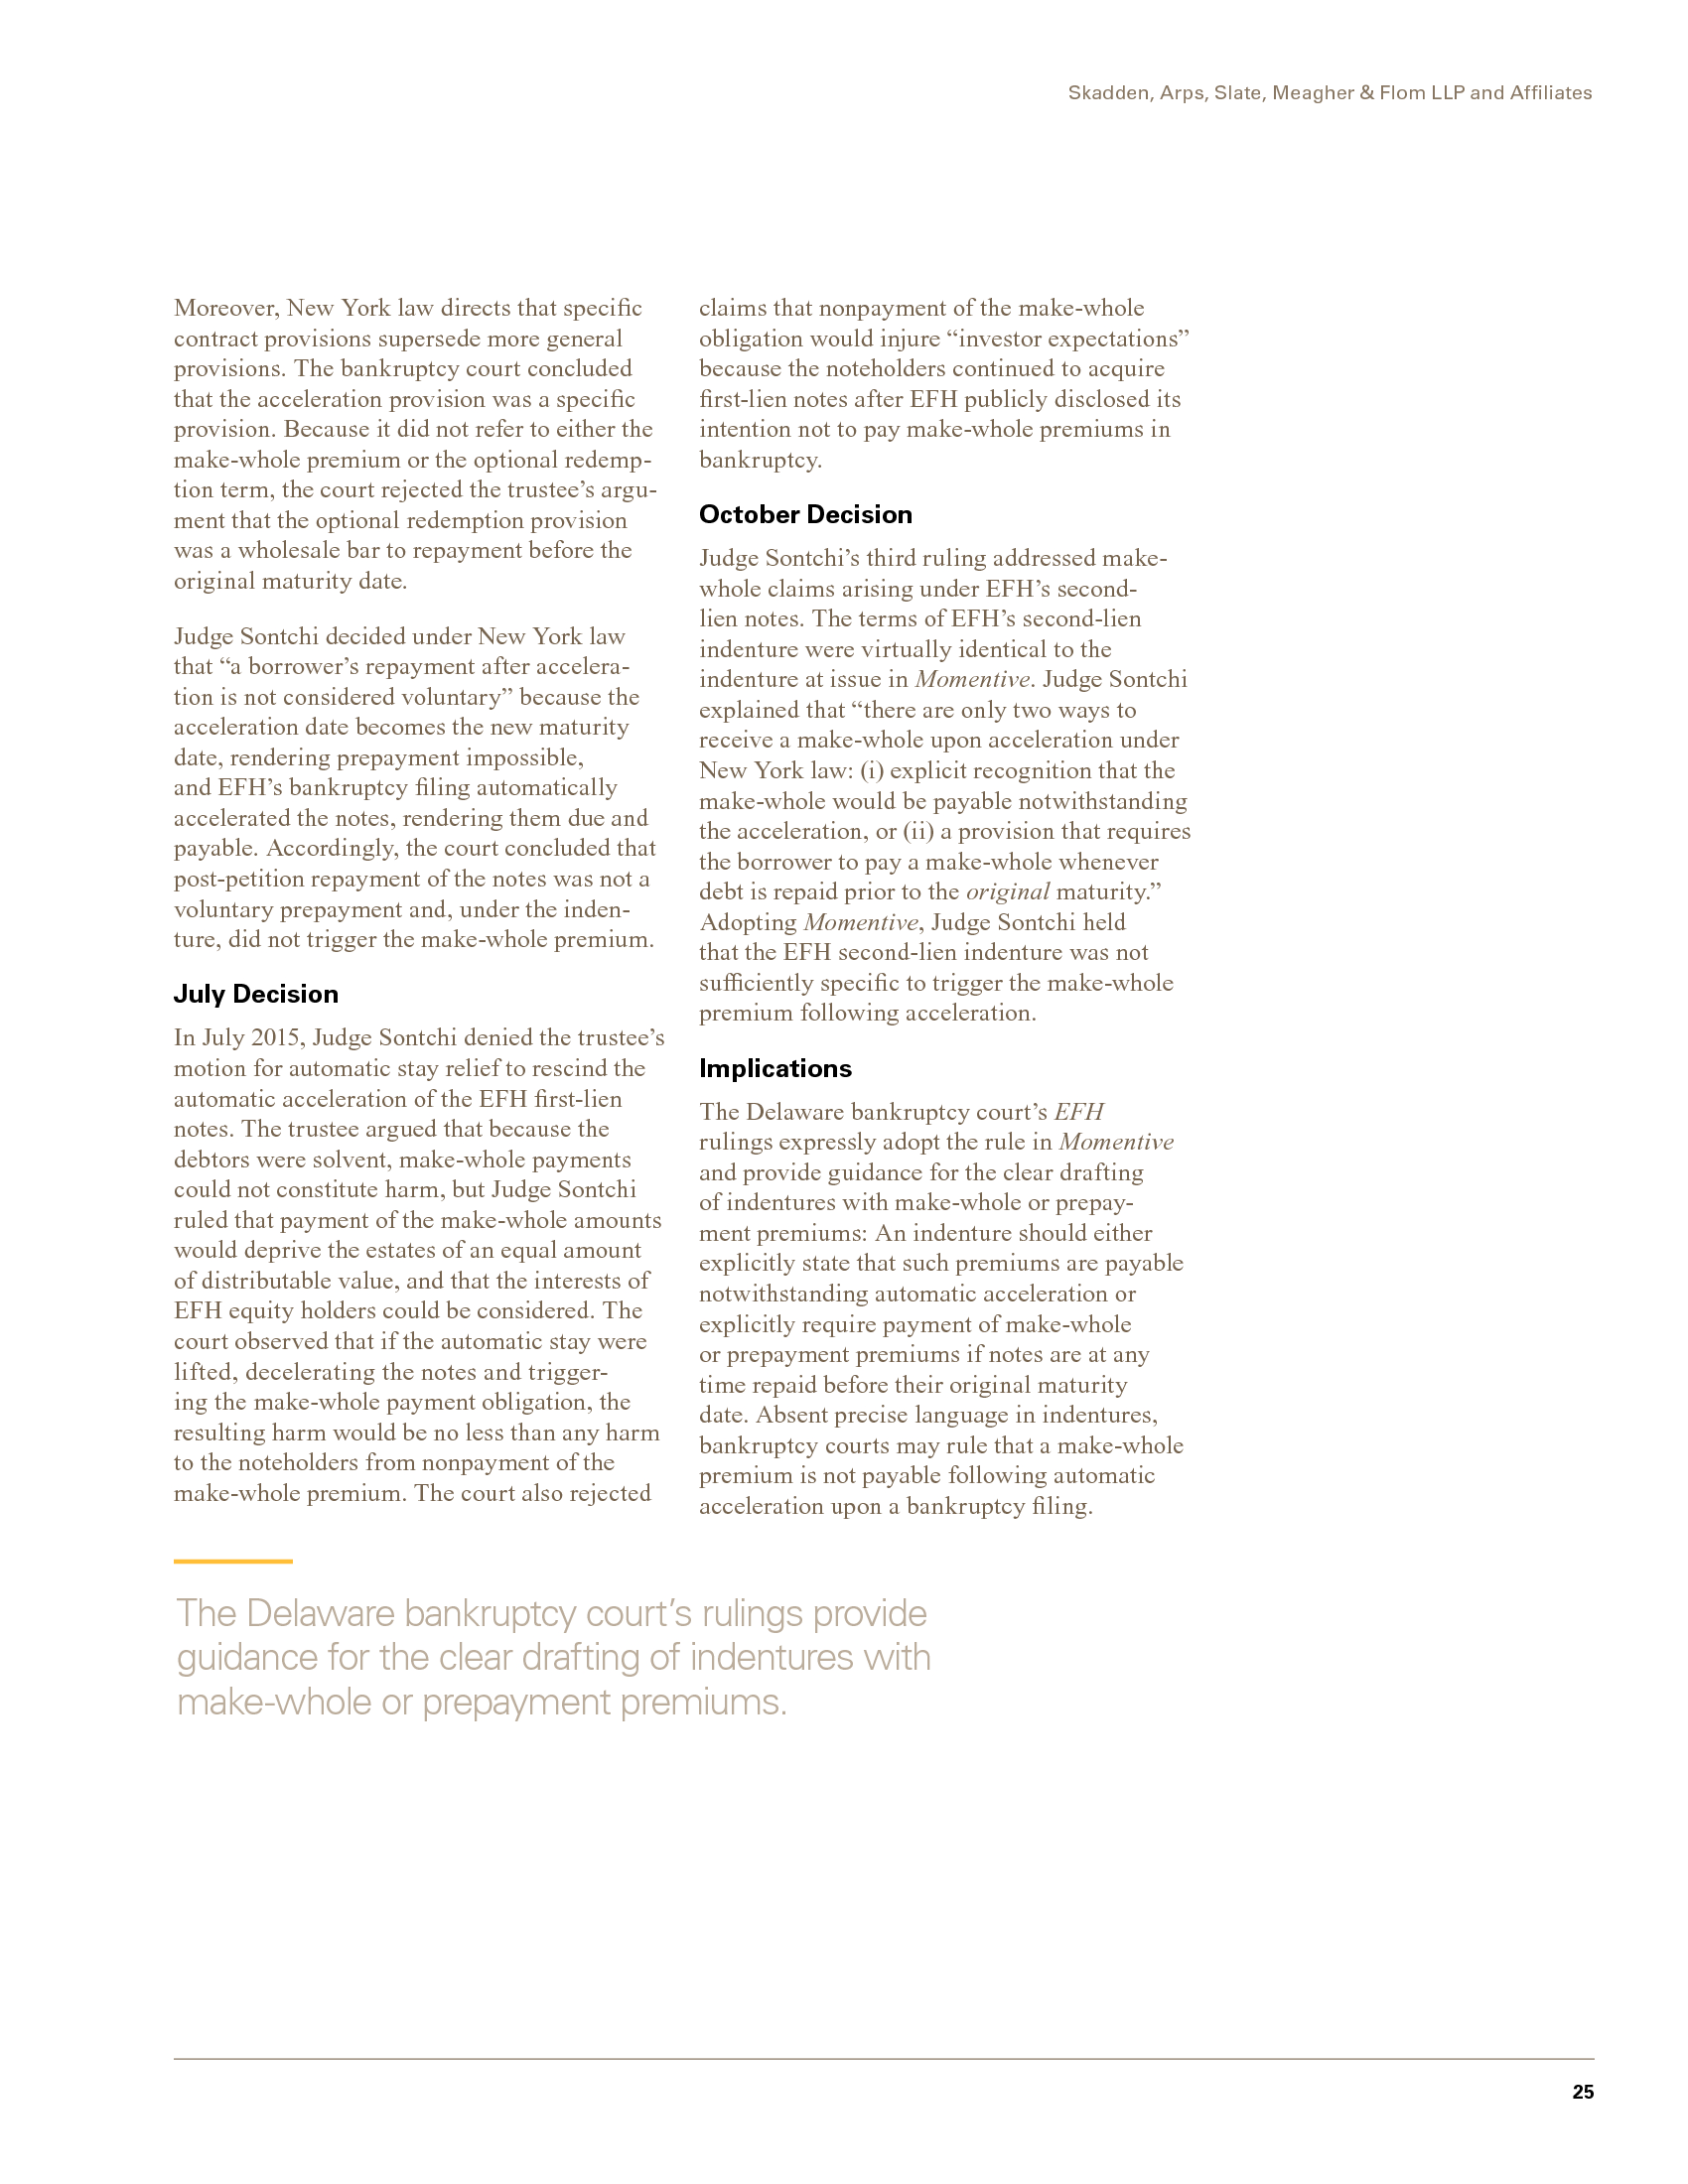 Advisorselect - 2016 Insights - A collection of memoranda